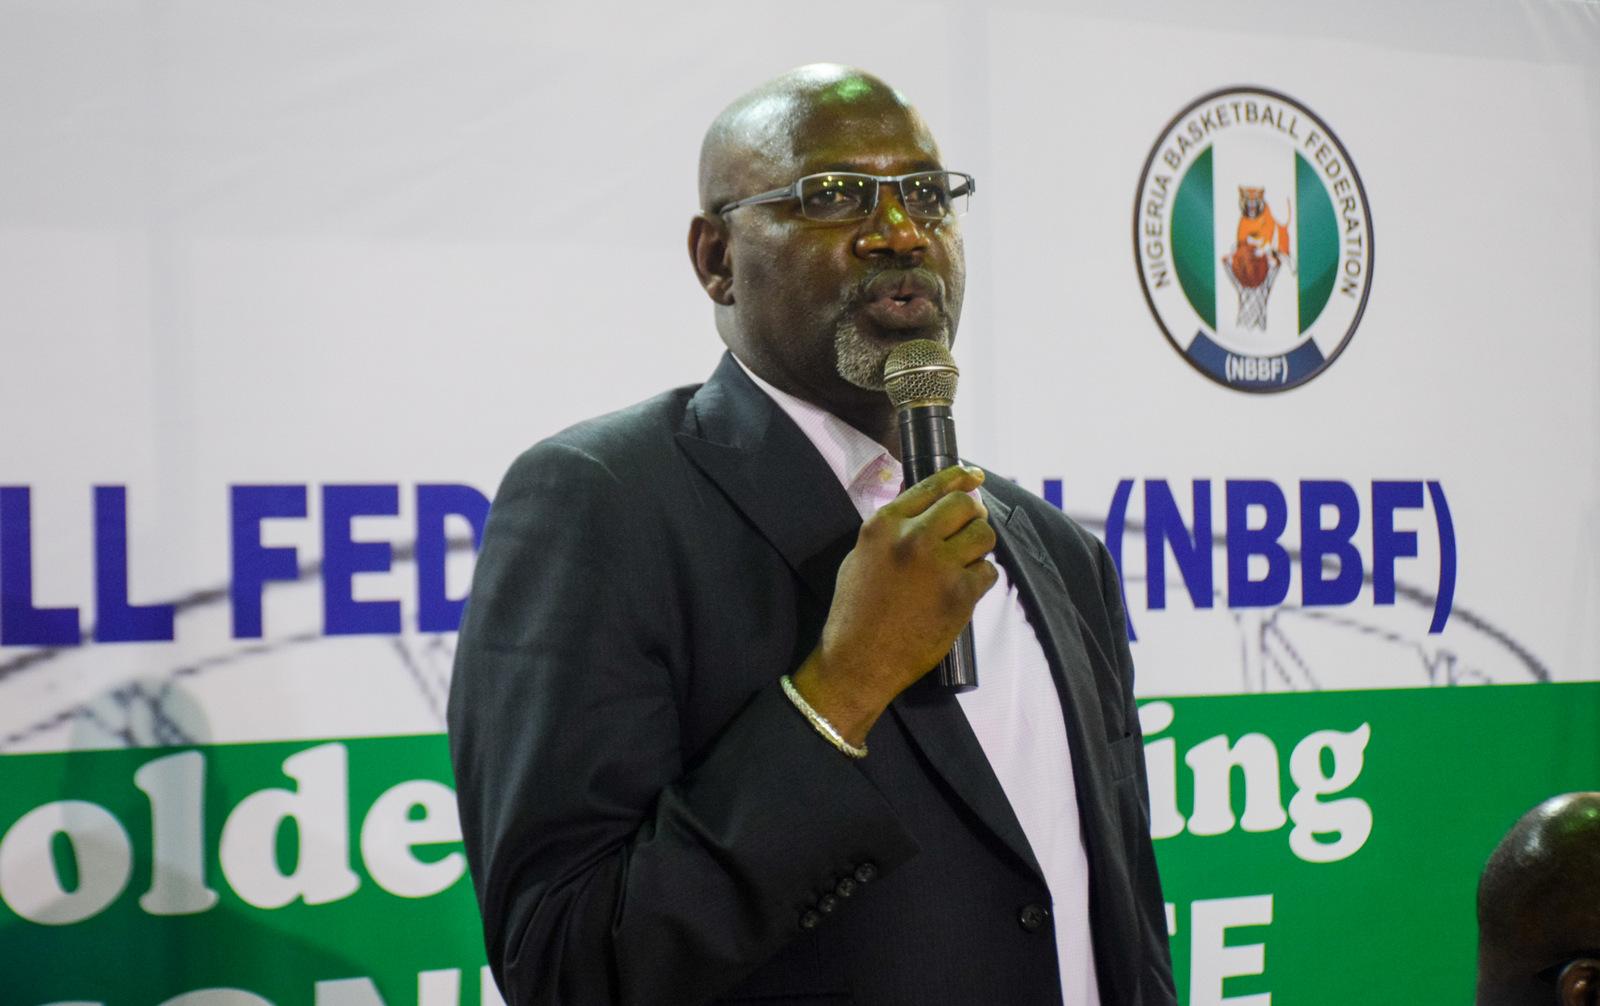 NBBF Stakeholders Meeting Lagos 2018